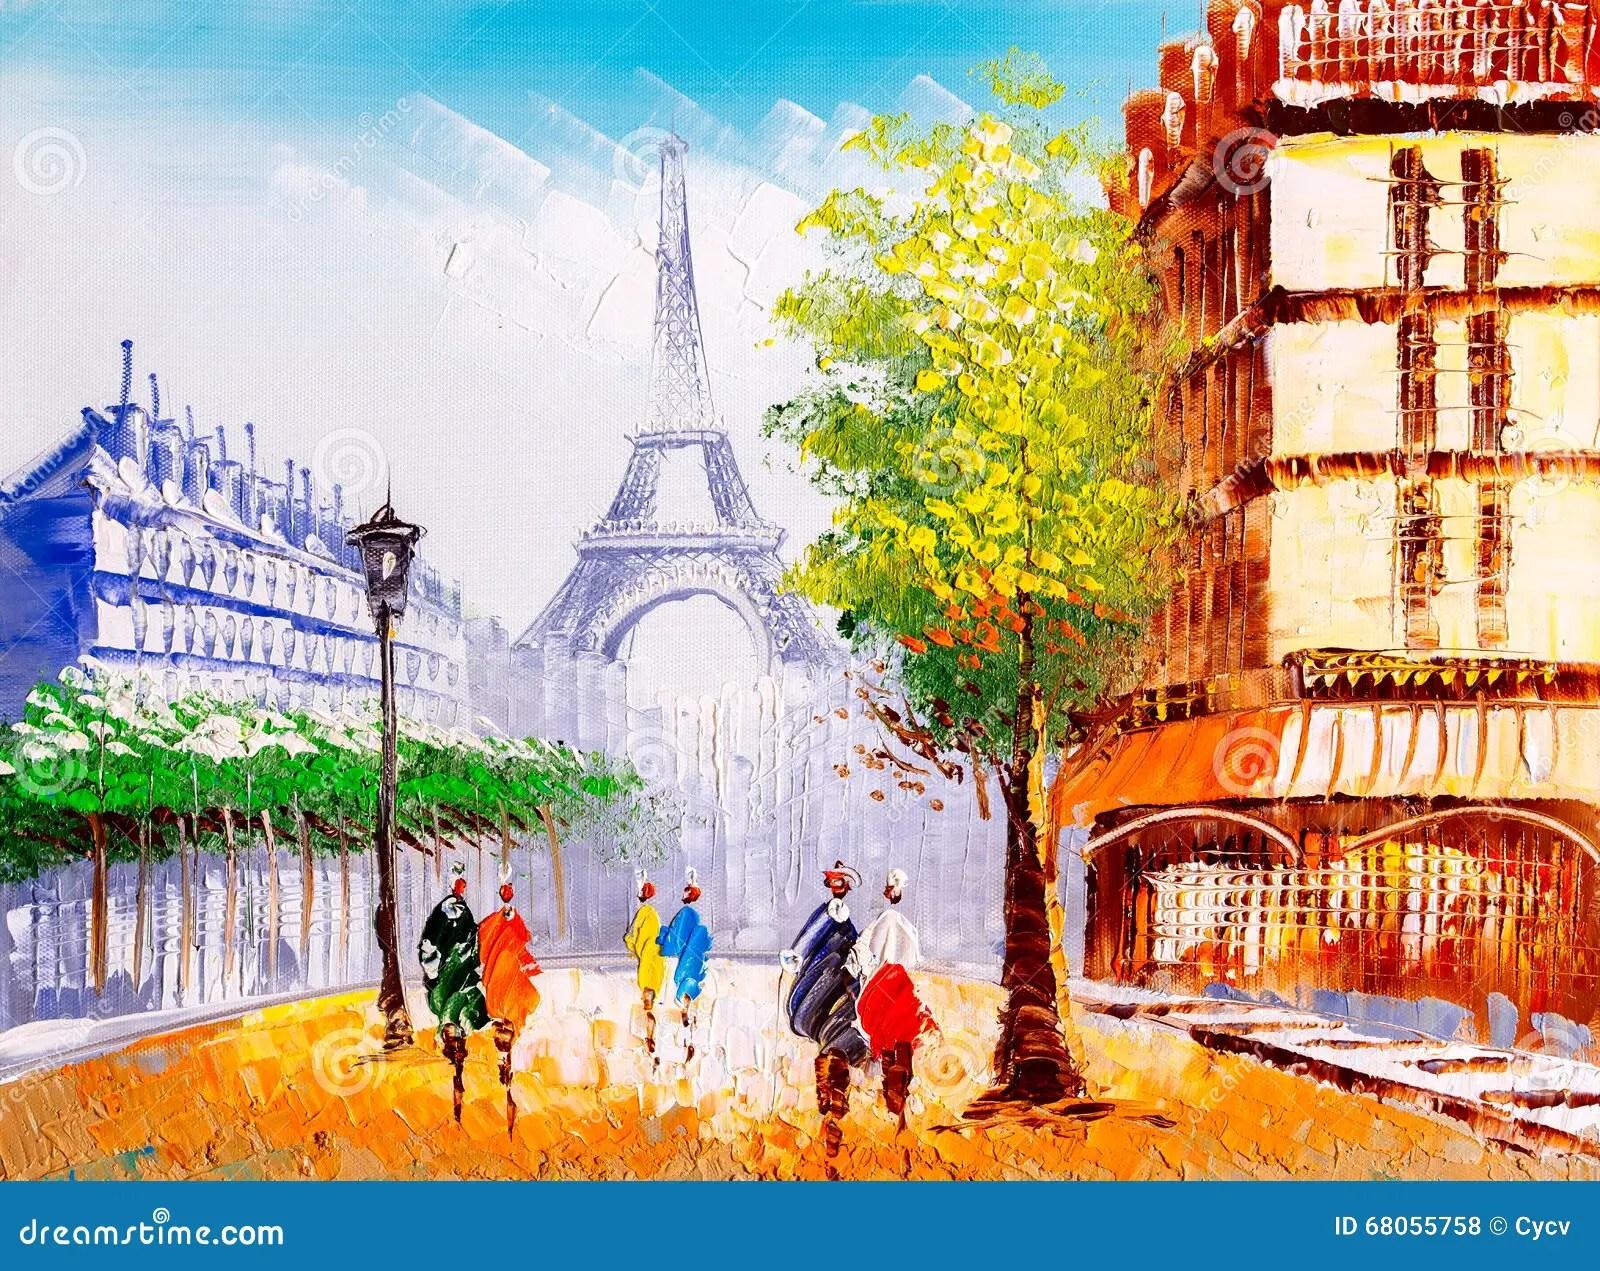 Audio Car Wallpaper Download Oil Painting Street View Of Paris Stock Illustration